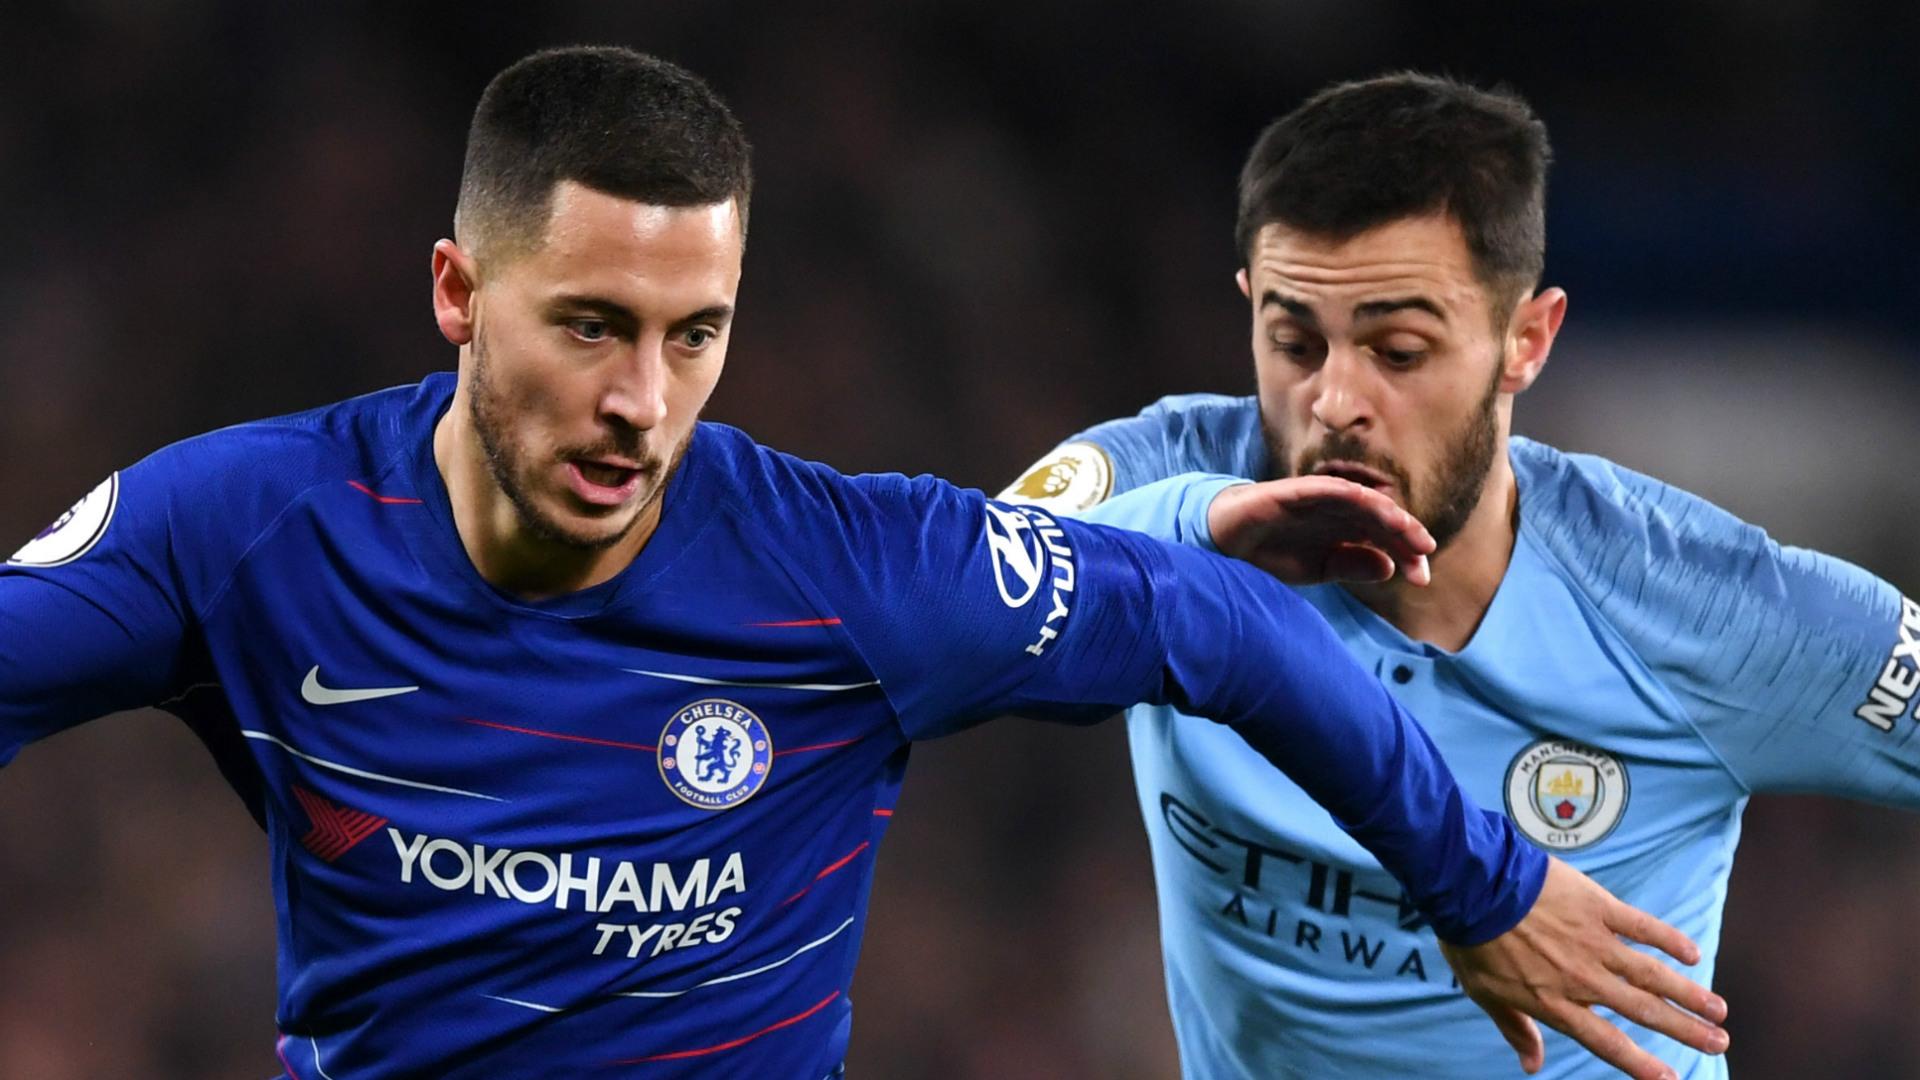 Eden Hazard Bernardo Silva Chelsea Man City 2018